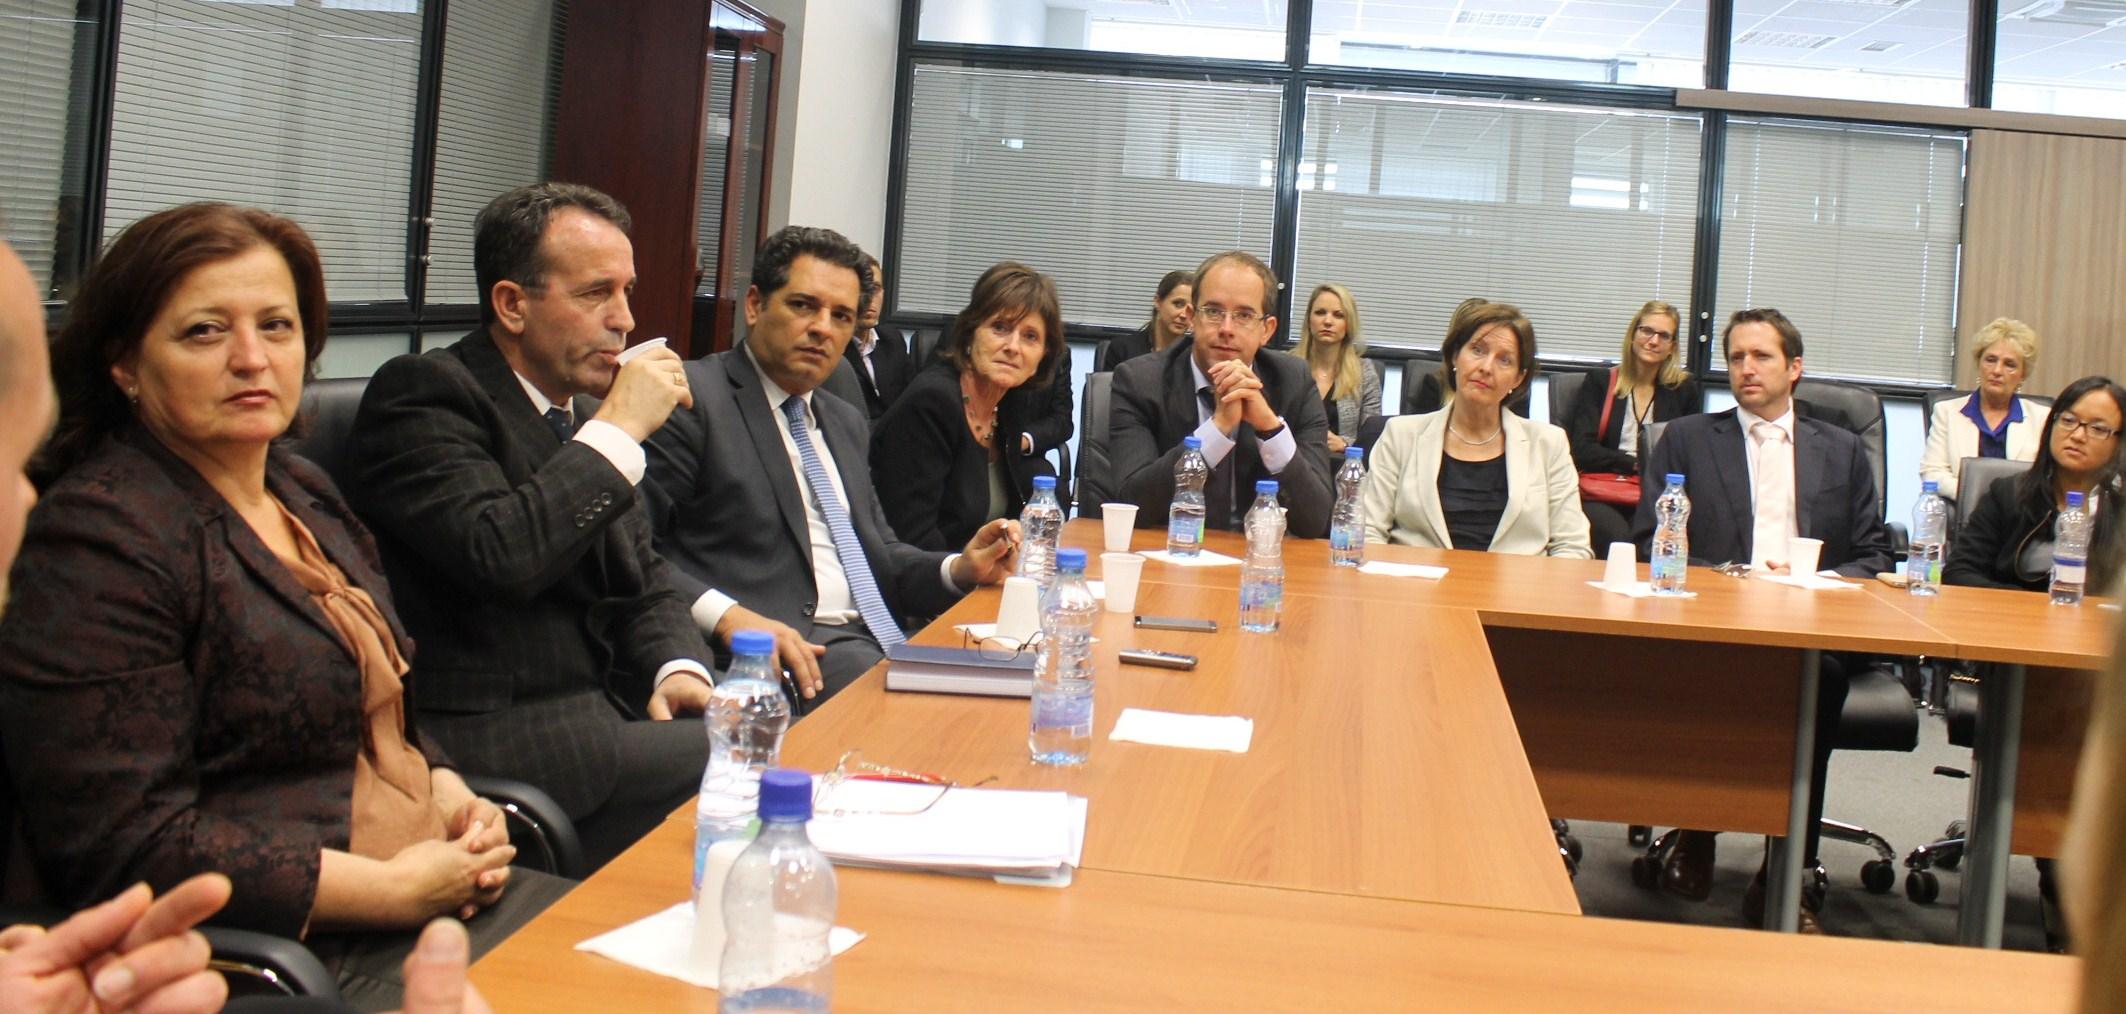 Delegacioni zviceran viziton Gjykatën Supreme